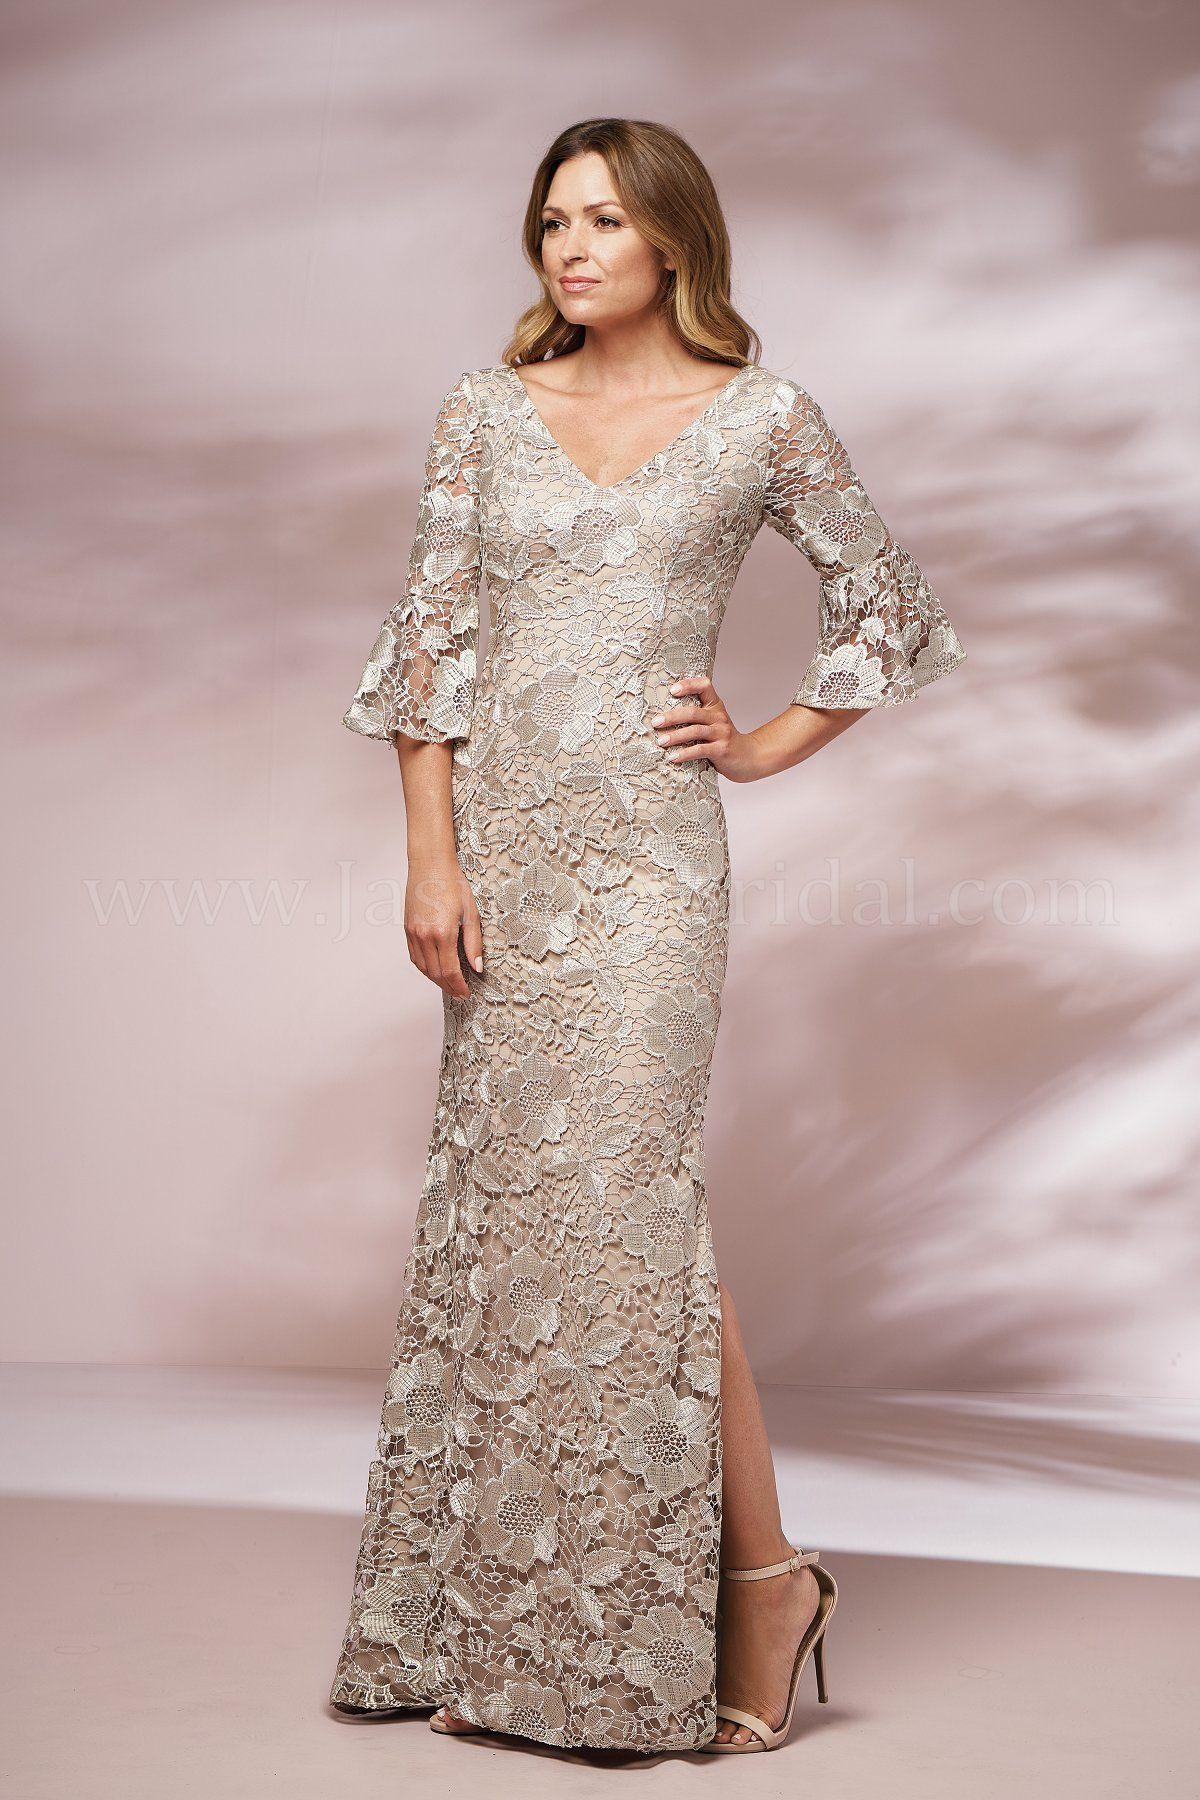 Jasmine Bridal Mother Of Groom Dresses Best Prom Dresses Mother Of The Bride Dresses